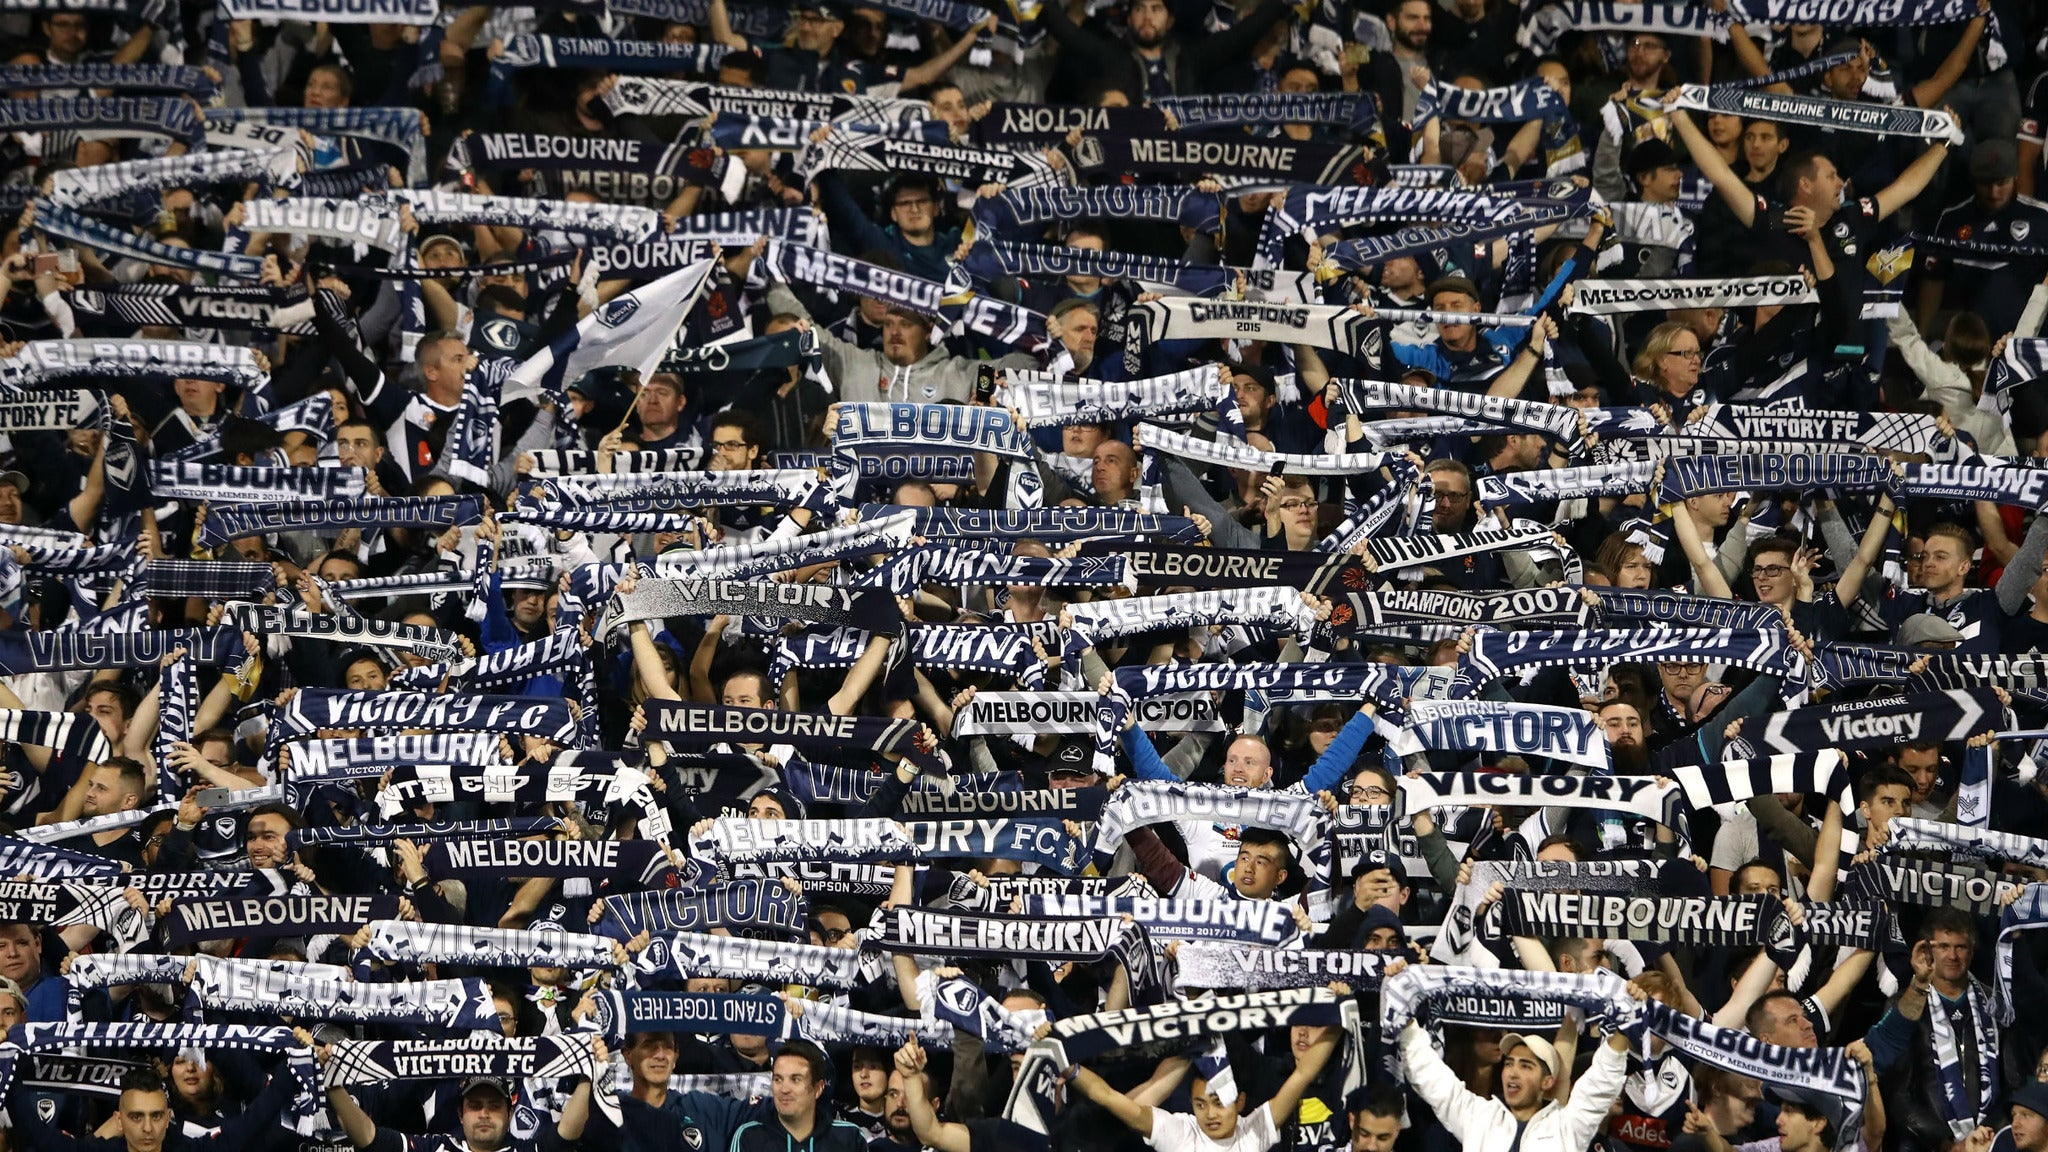 Melbourne Victory v Melbourne City - Members